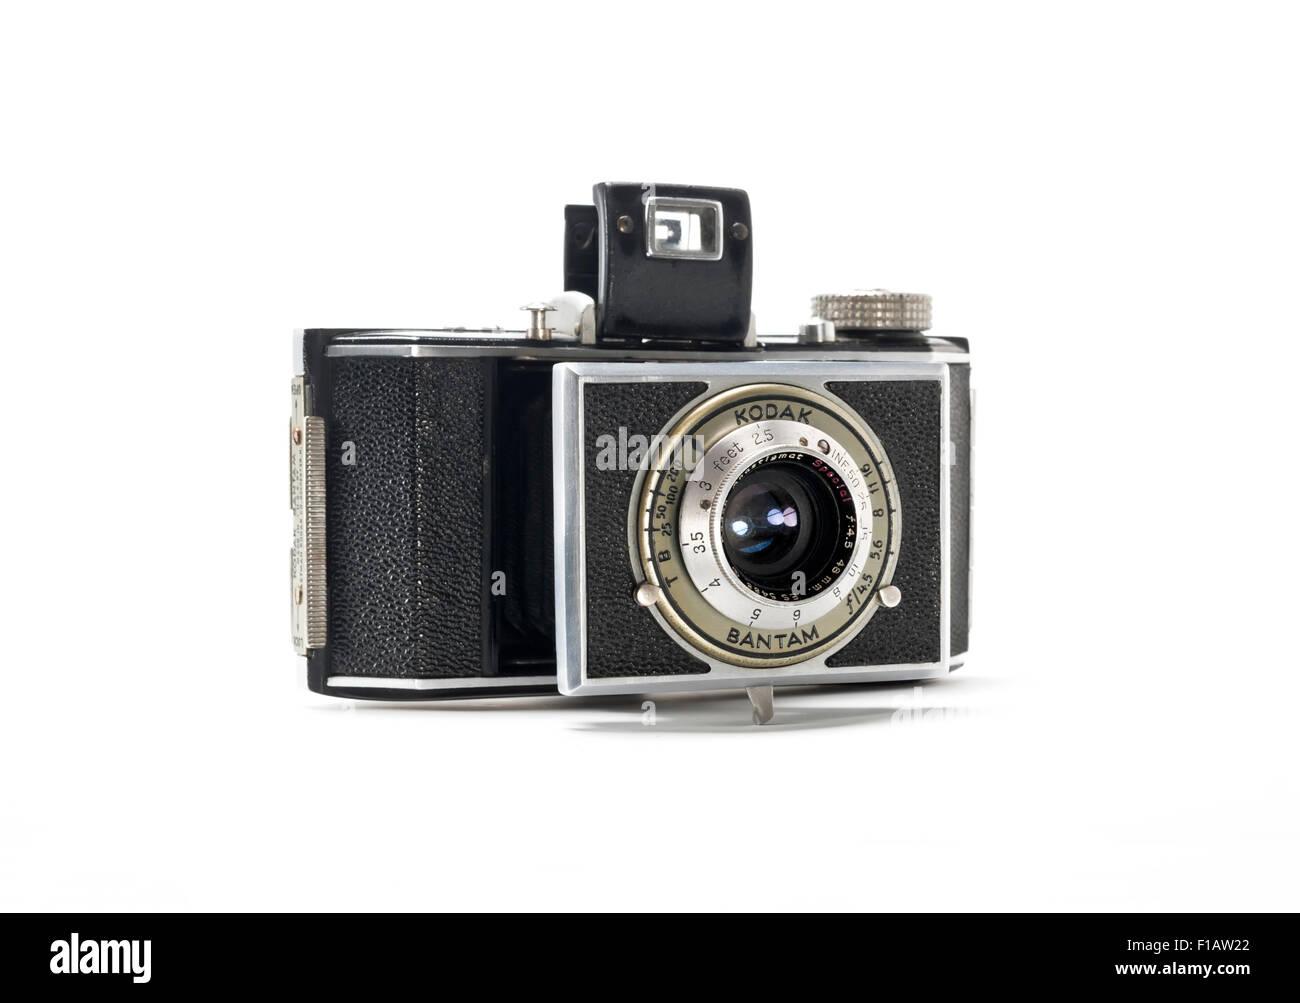 Vintage Kodak Bantam Camera from the 1930's - Stock Image